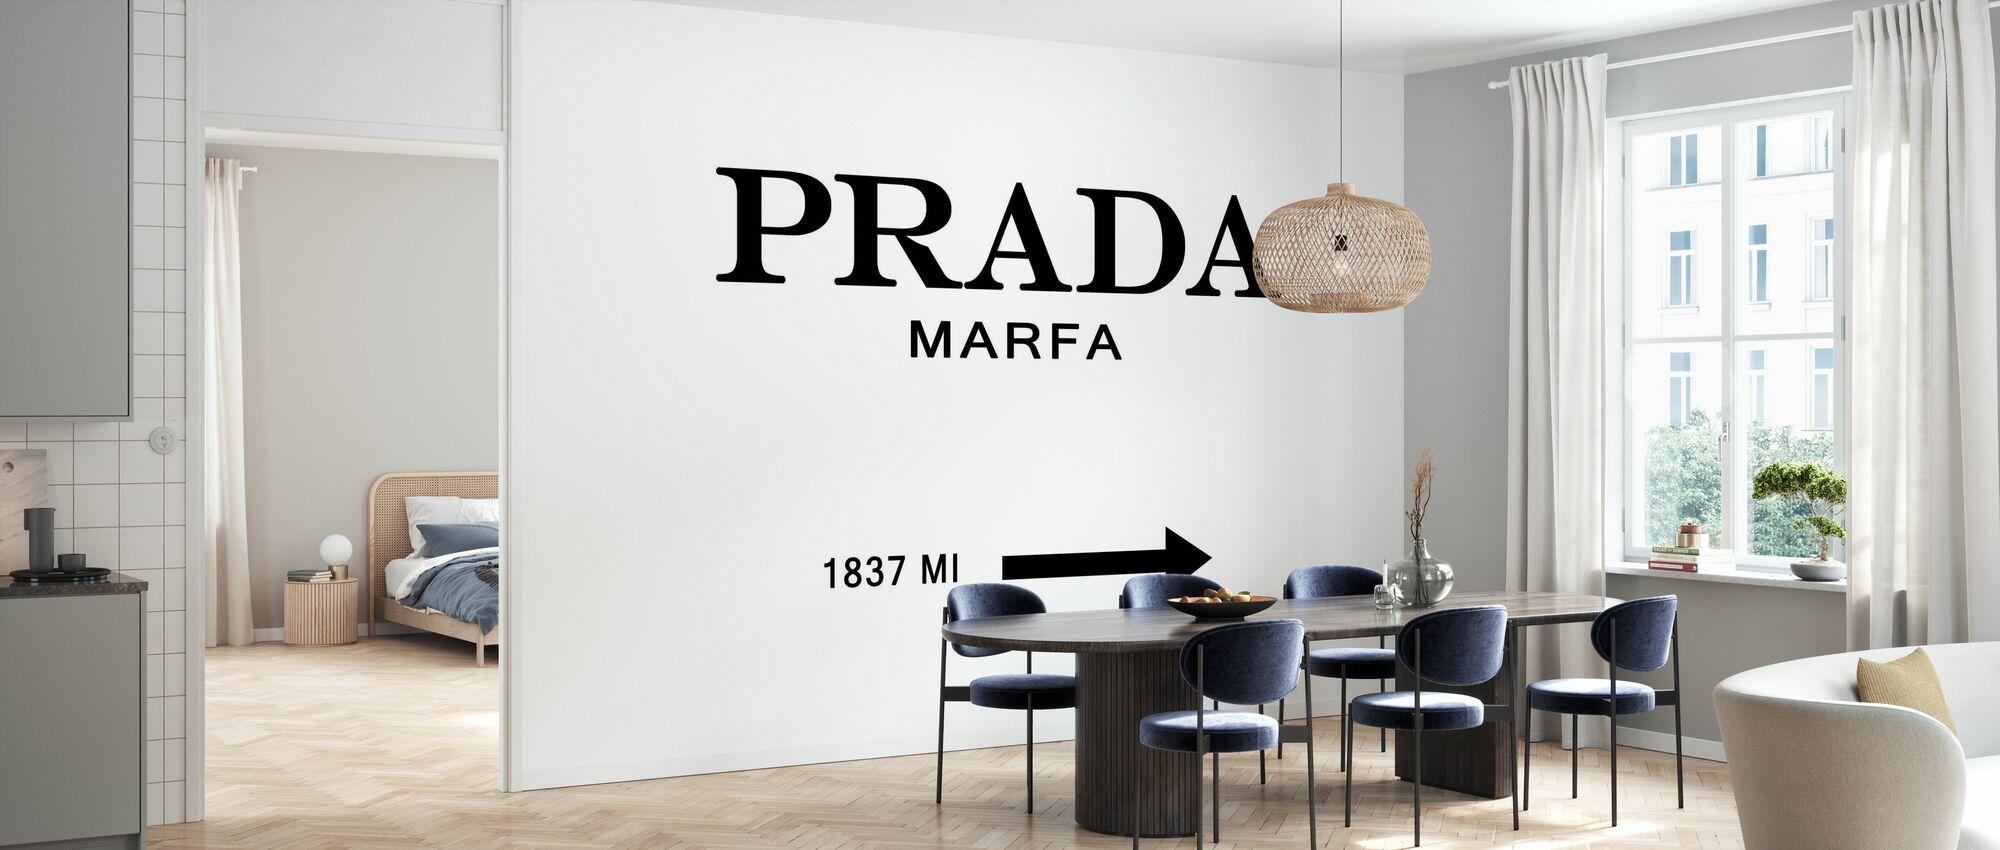 Prada Marfa - Tapeta - Kuchnia